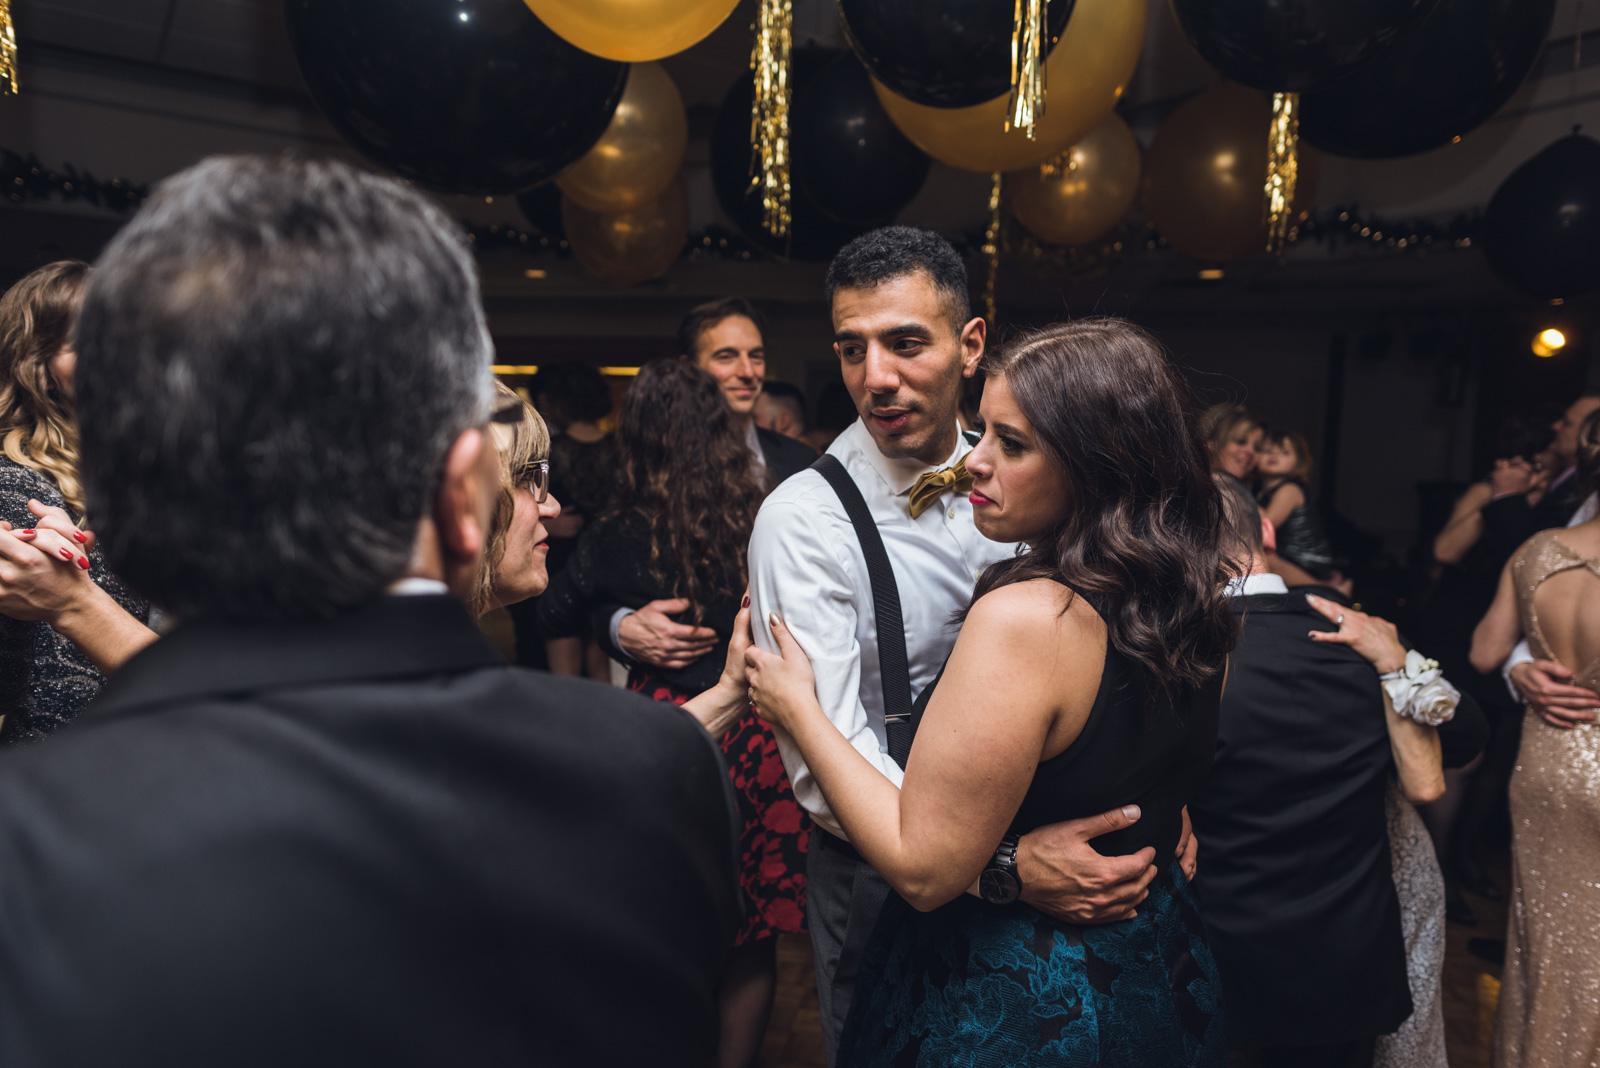 rheana-chris-wedding-blog-297.jpg